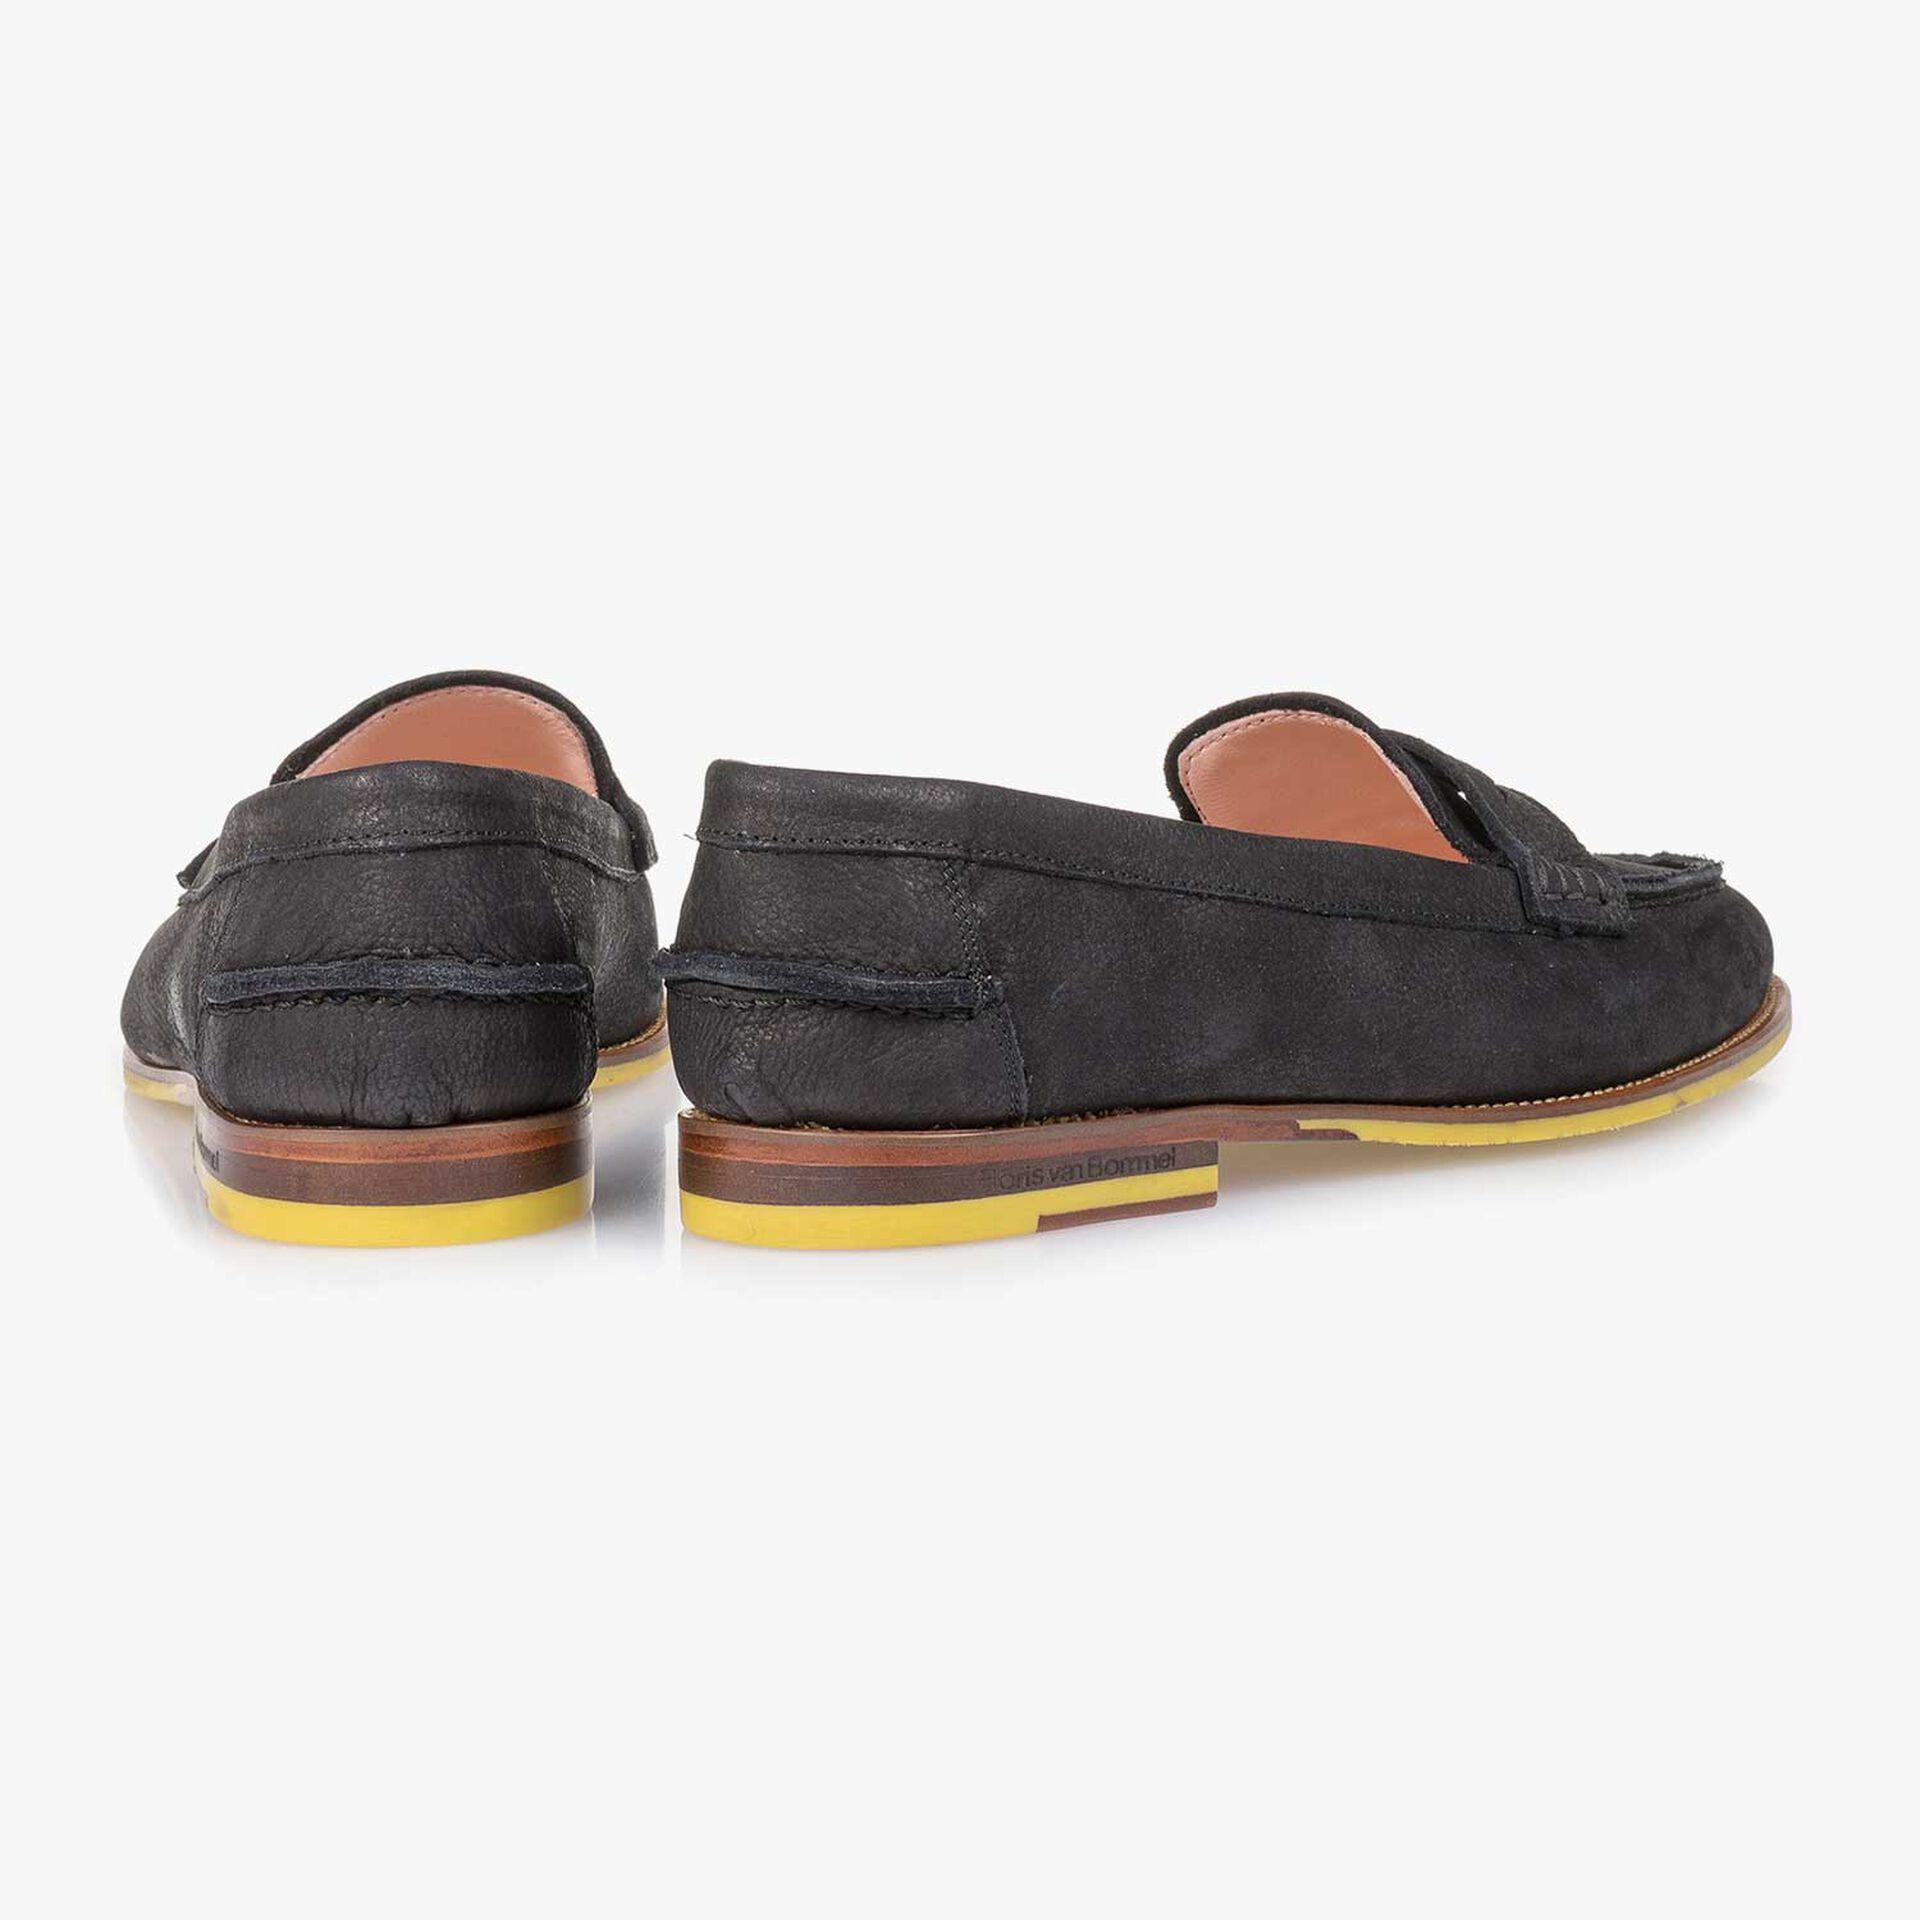 Black structured nubuck leather loafer